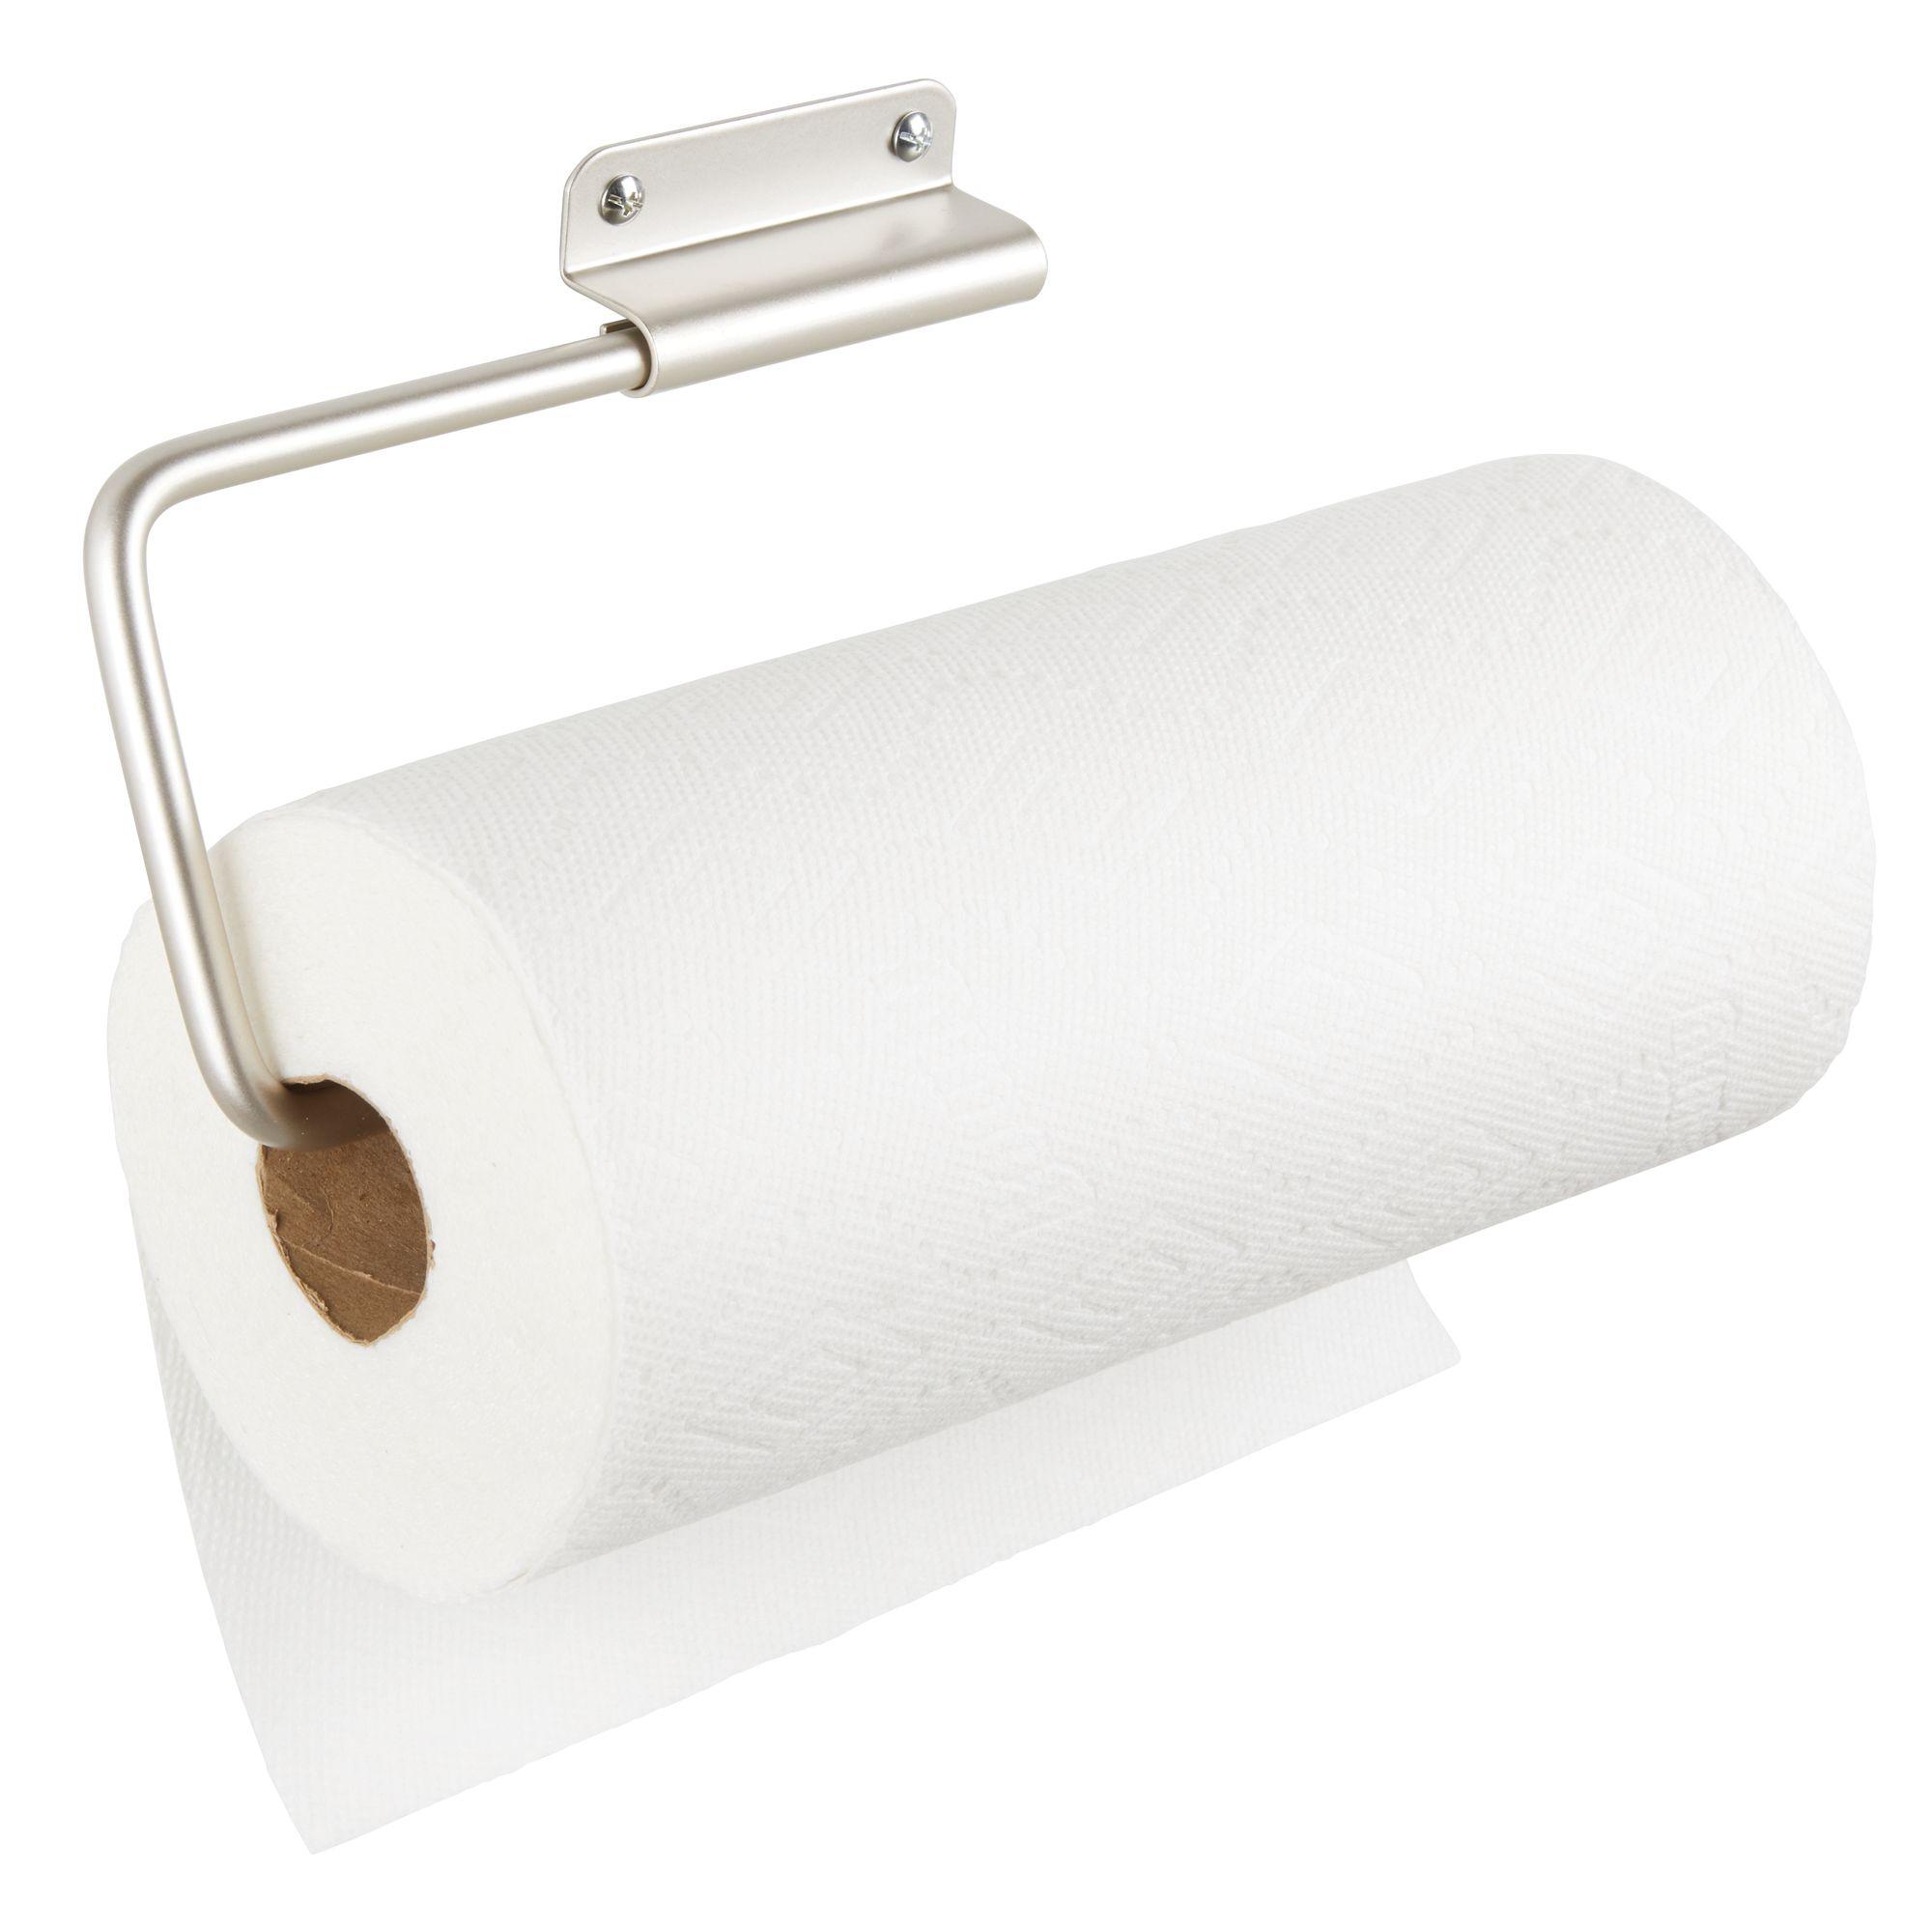 mDesign Metal Wall Mount Under Cabinet Paper Towel Holder